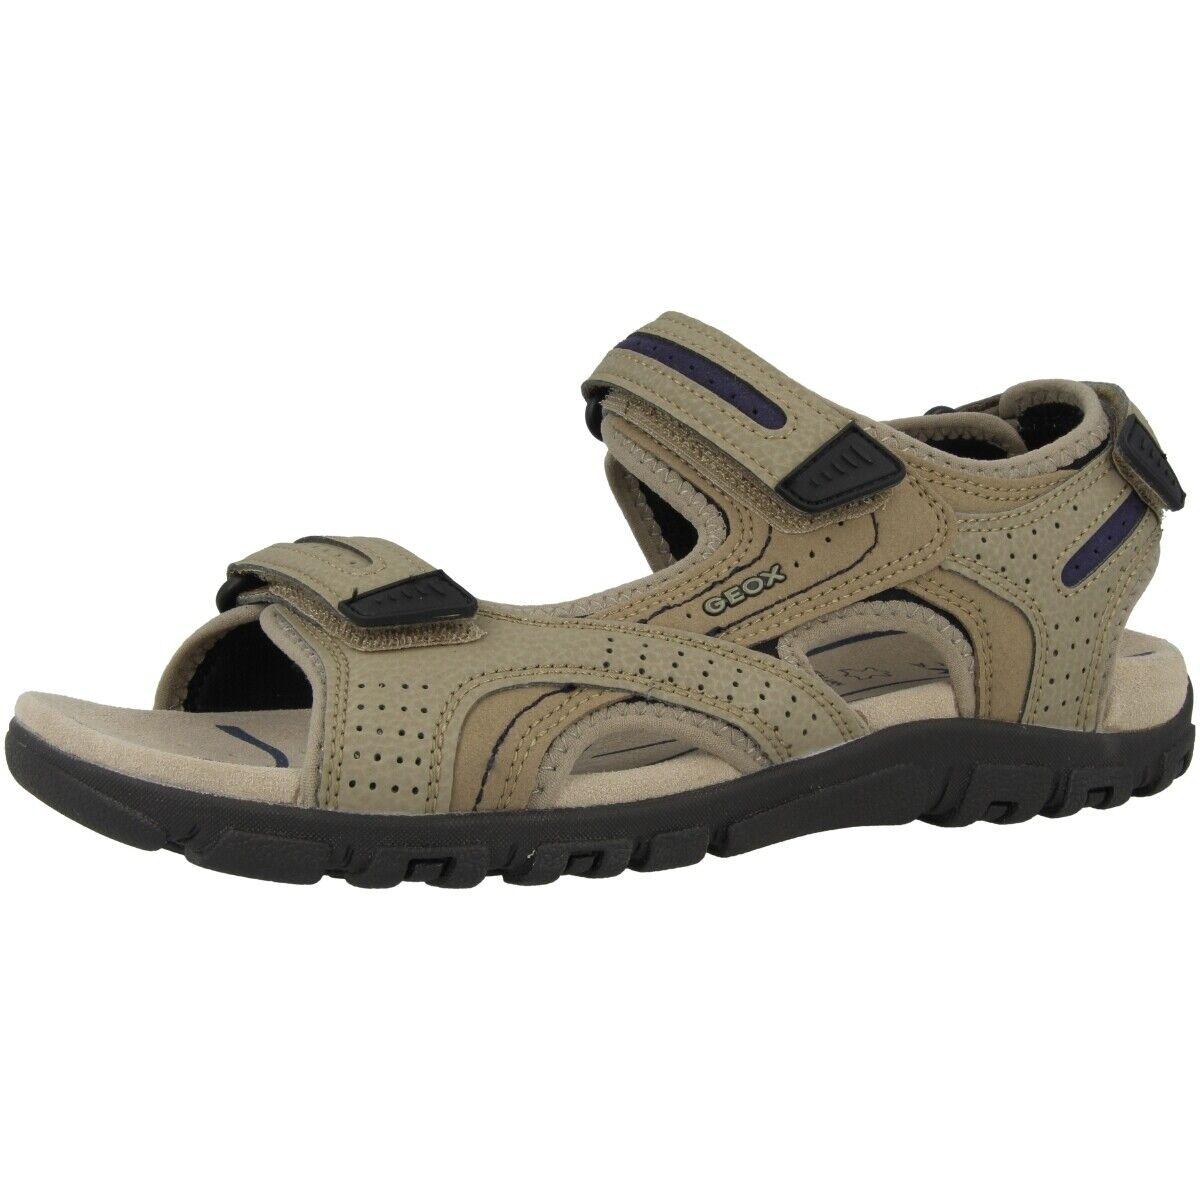 GEOX U Strada D Schuhe Herren Sandalen Trekking Sandaletten U8224D050AUC0829  | Moderner Modus  | Elegante Form